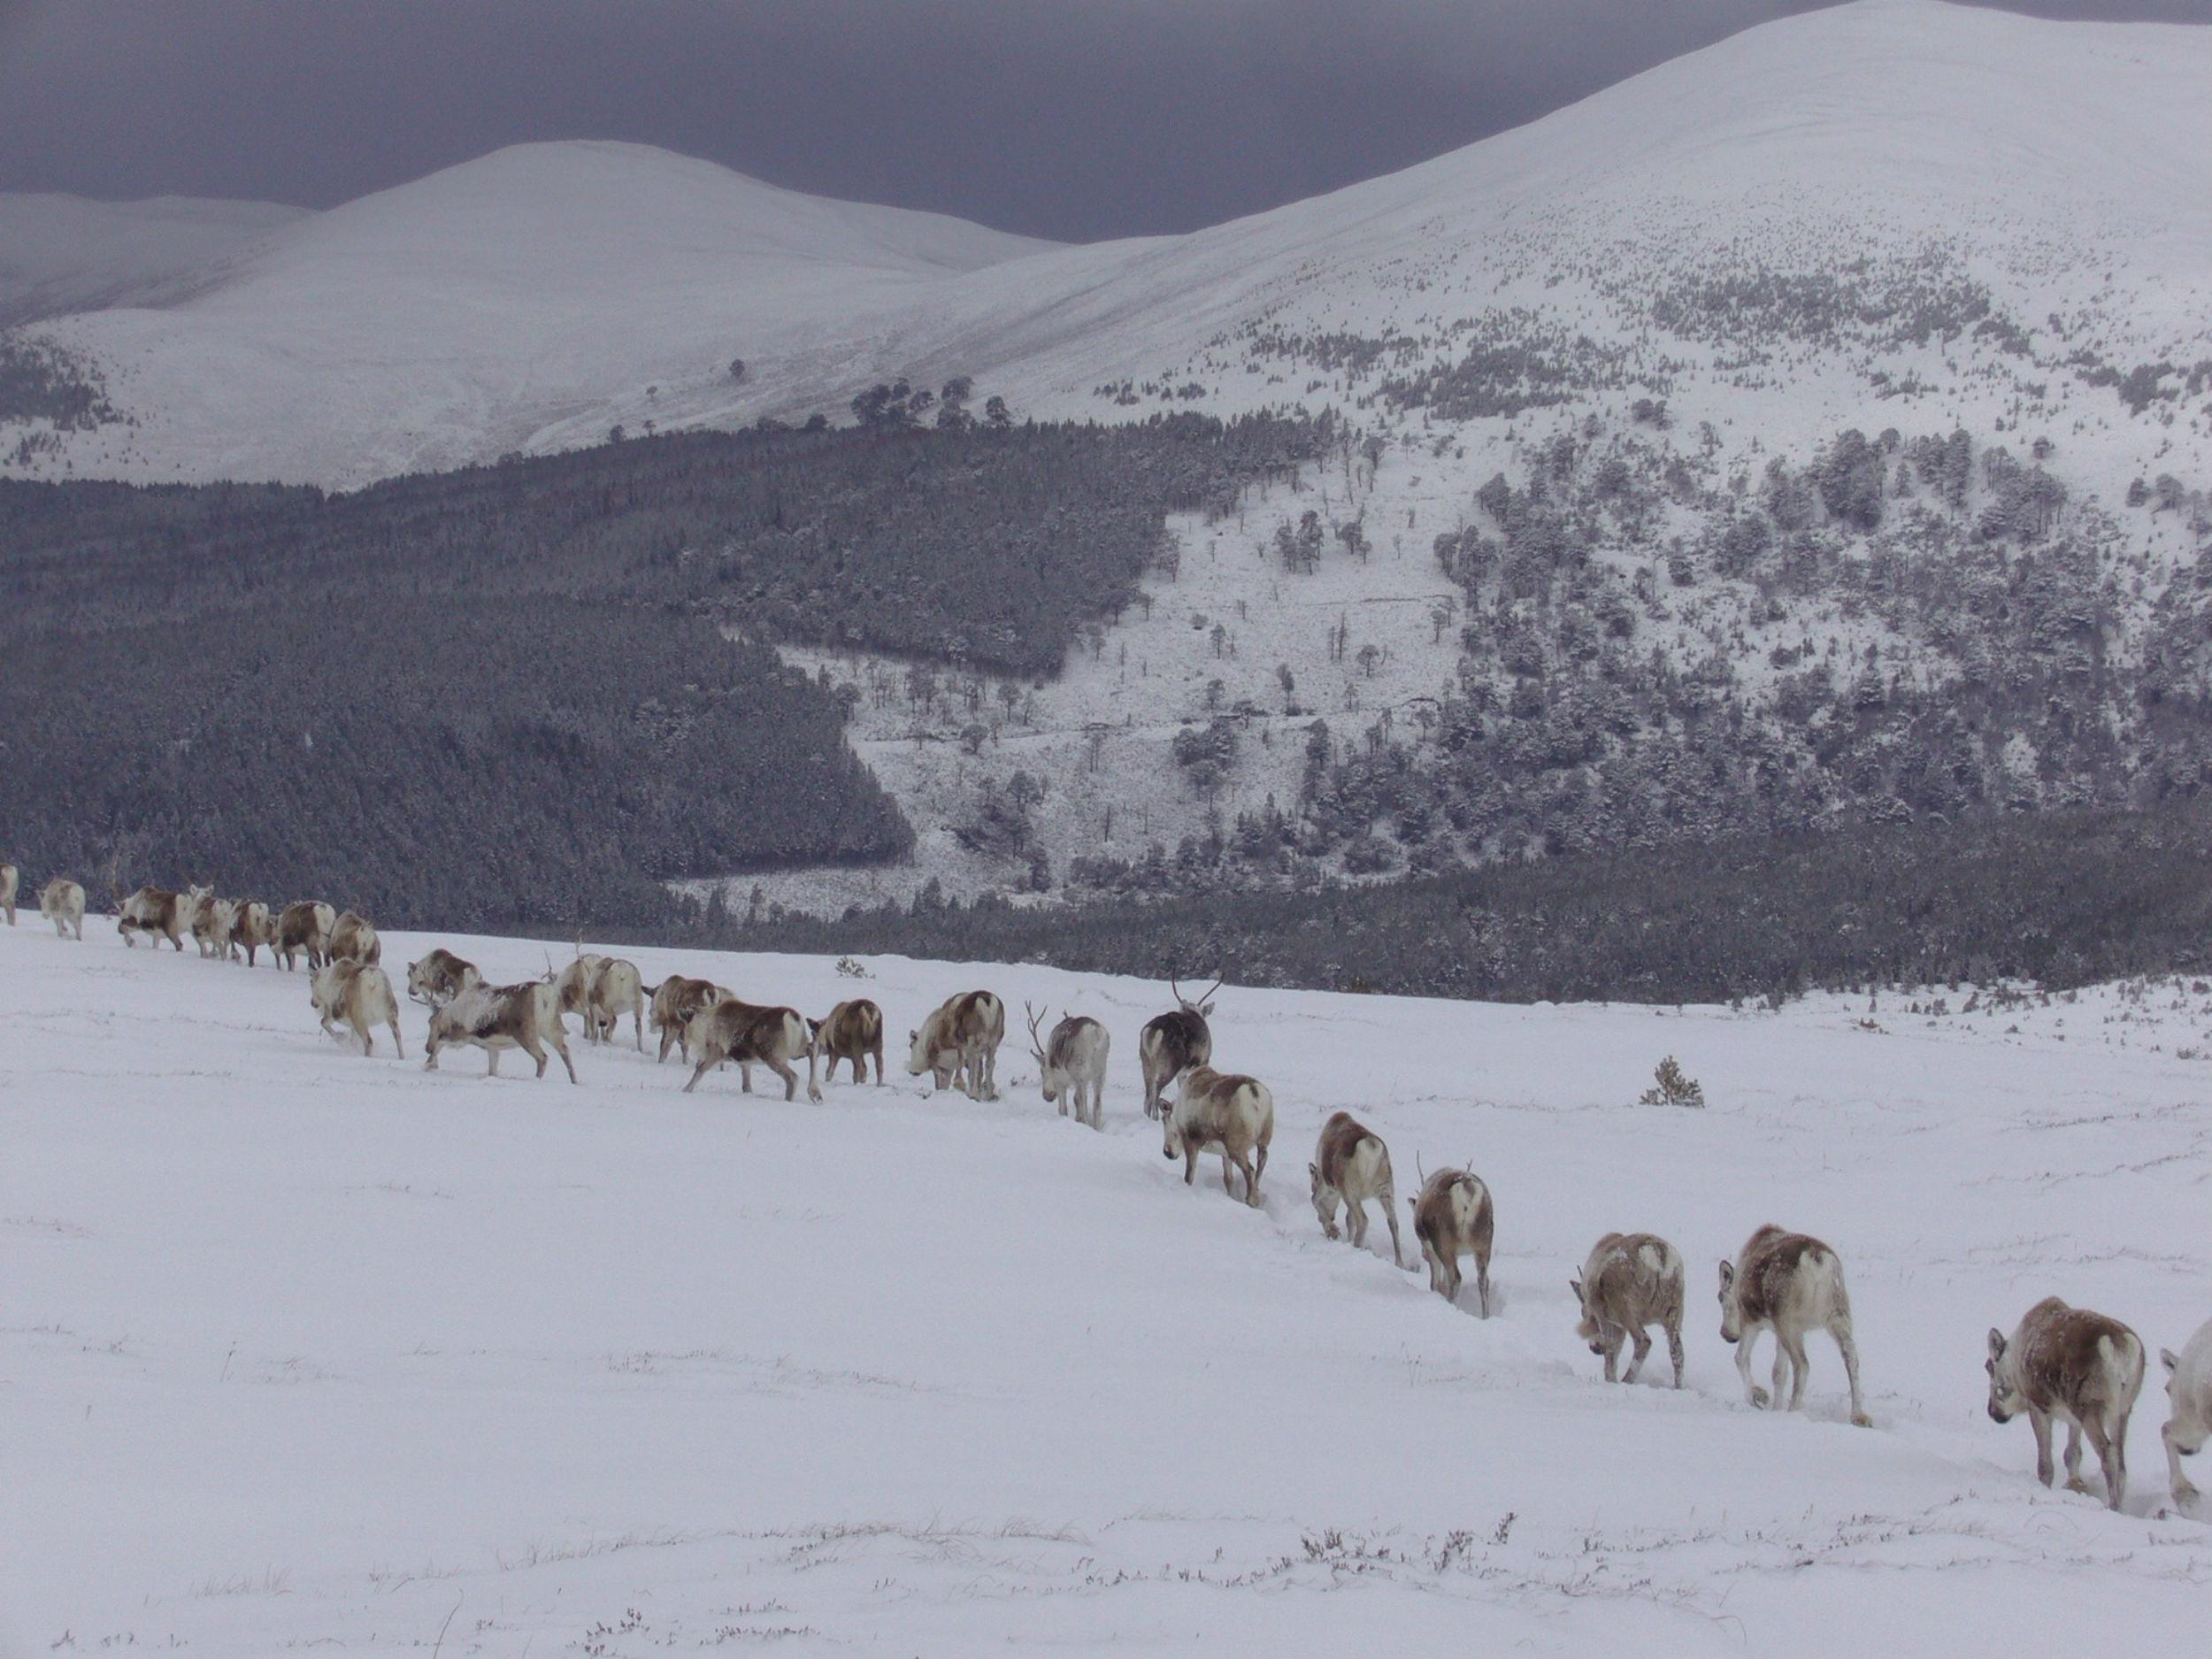 Reindeer moving down mountain - Scottish news